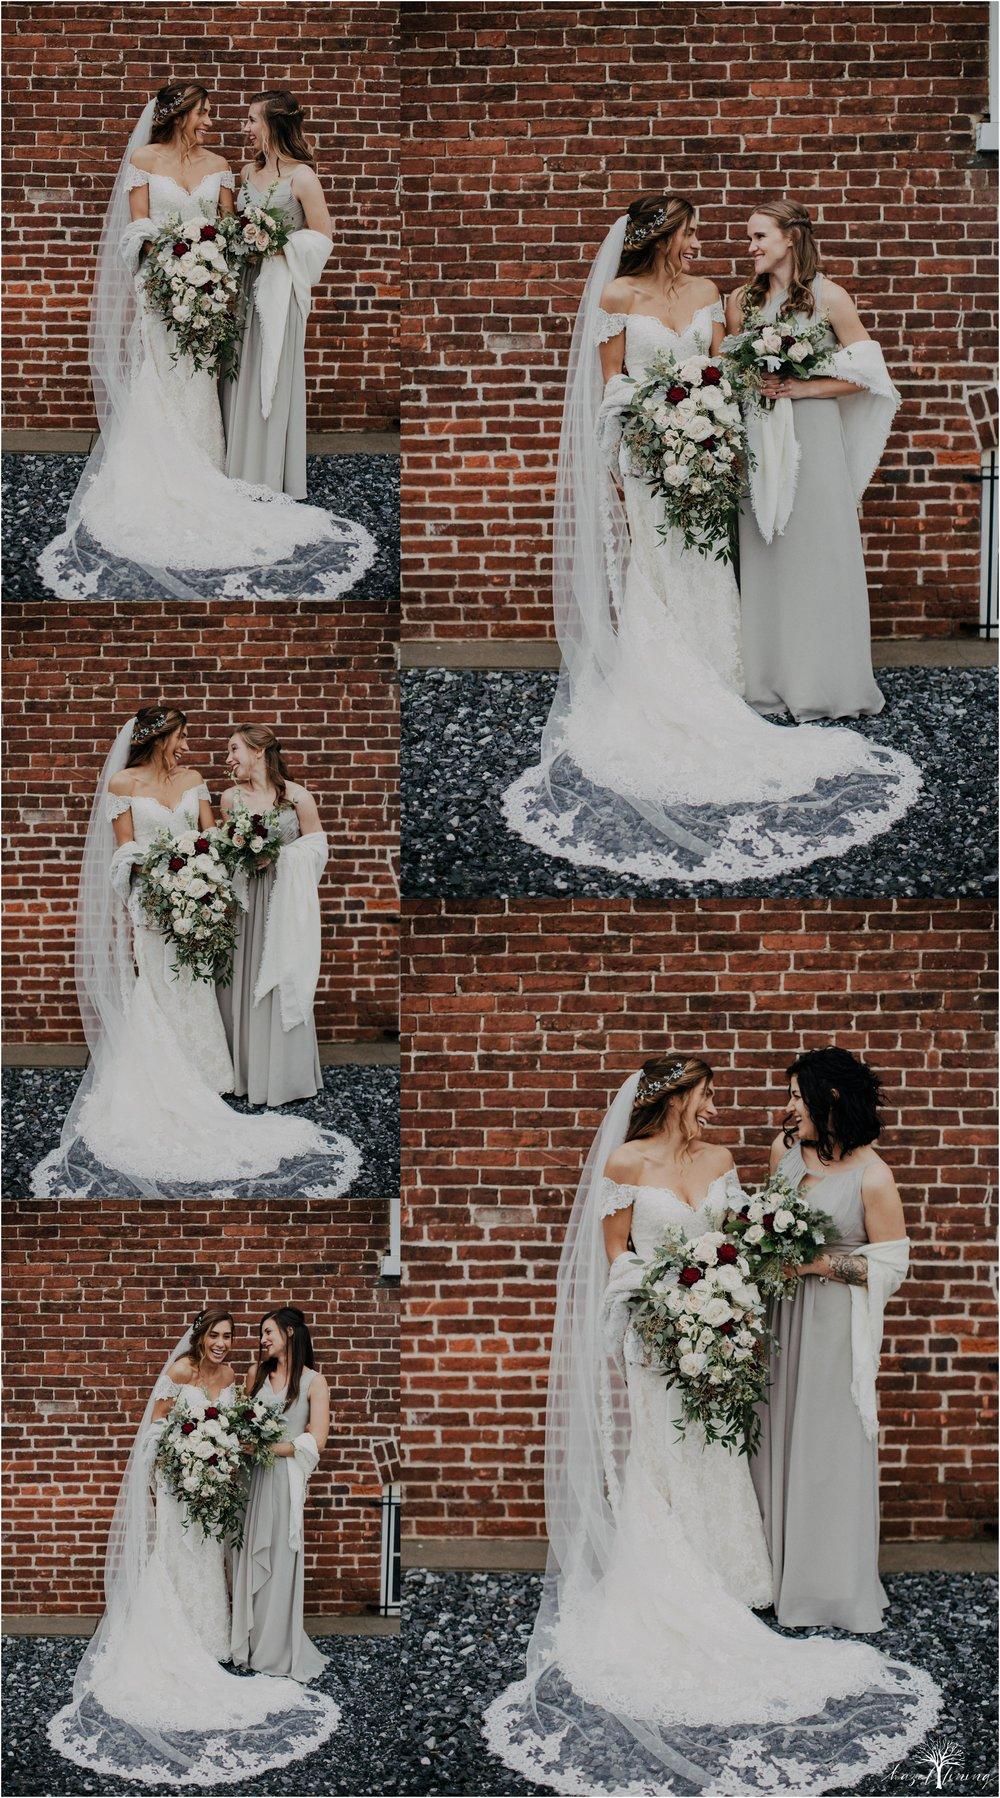 emma-matt-gehringer-the-booking-house-lancaster-manhiem-pennsylvania-winter-wedding_0086.jpg